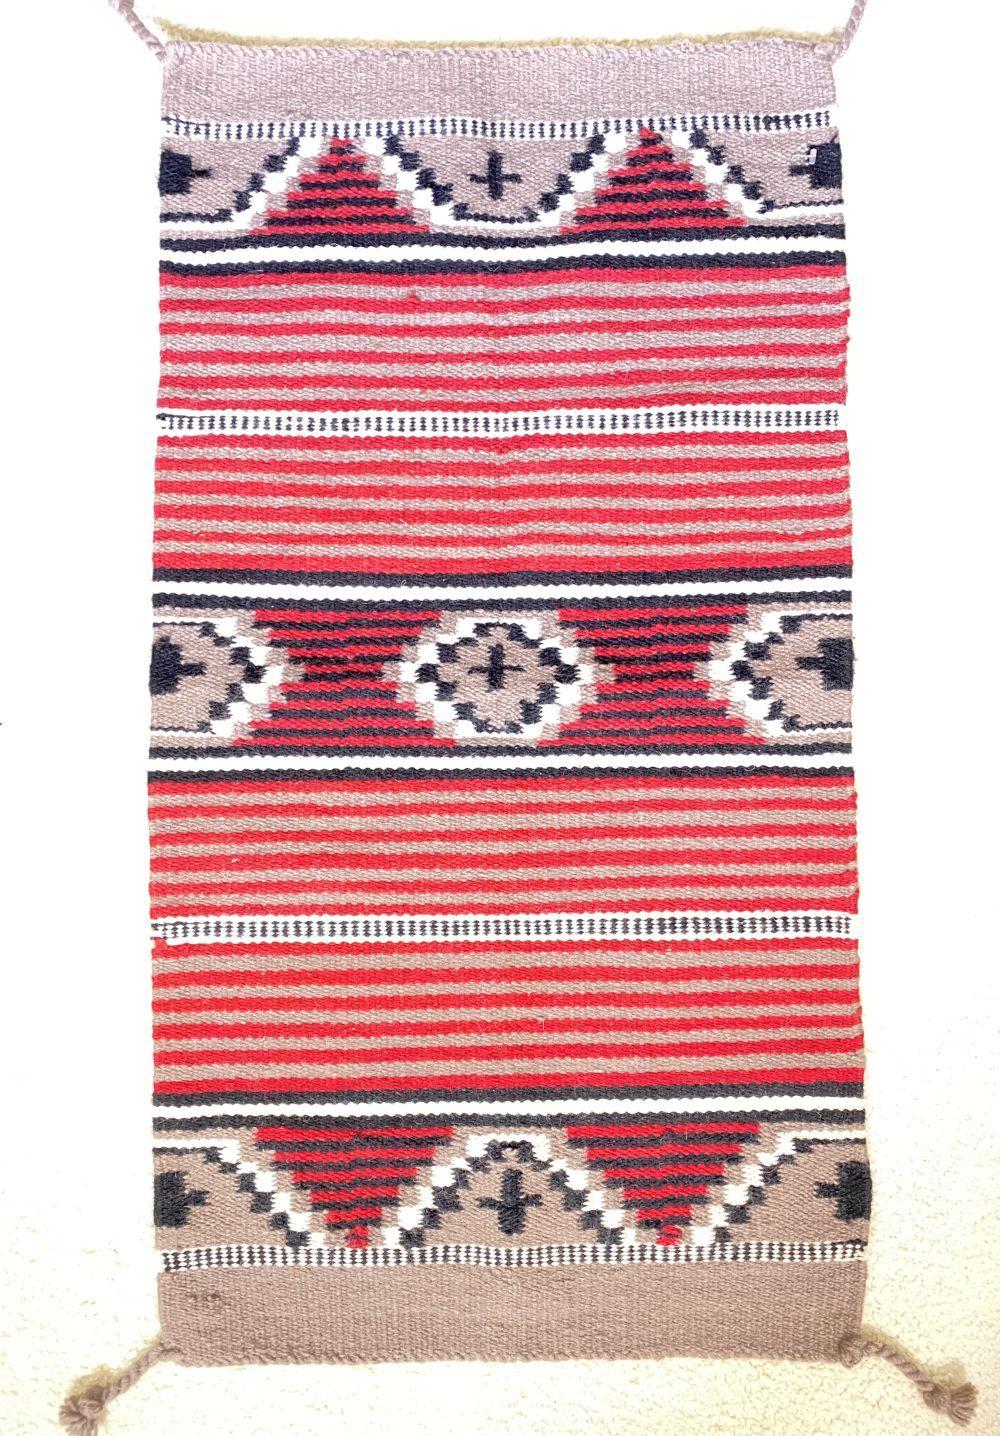 Native American Tribal Saddle Blanket Rug